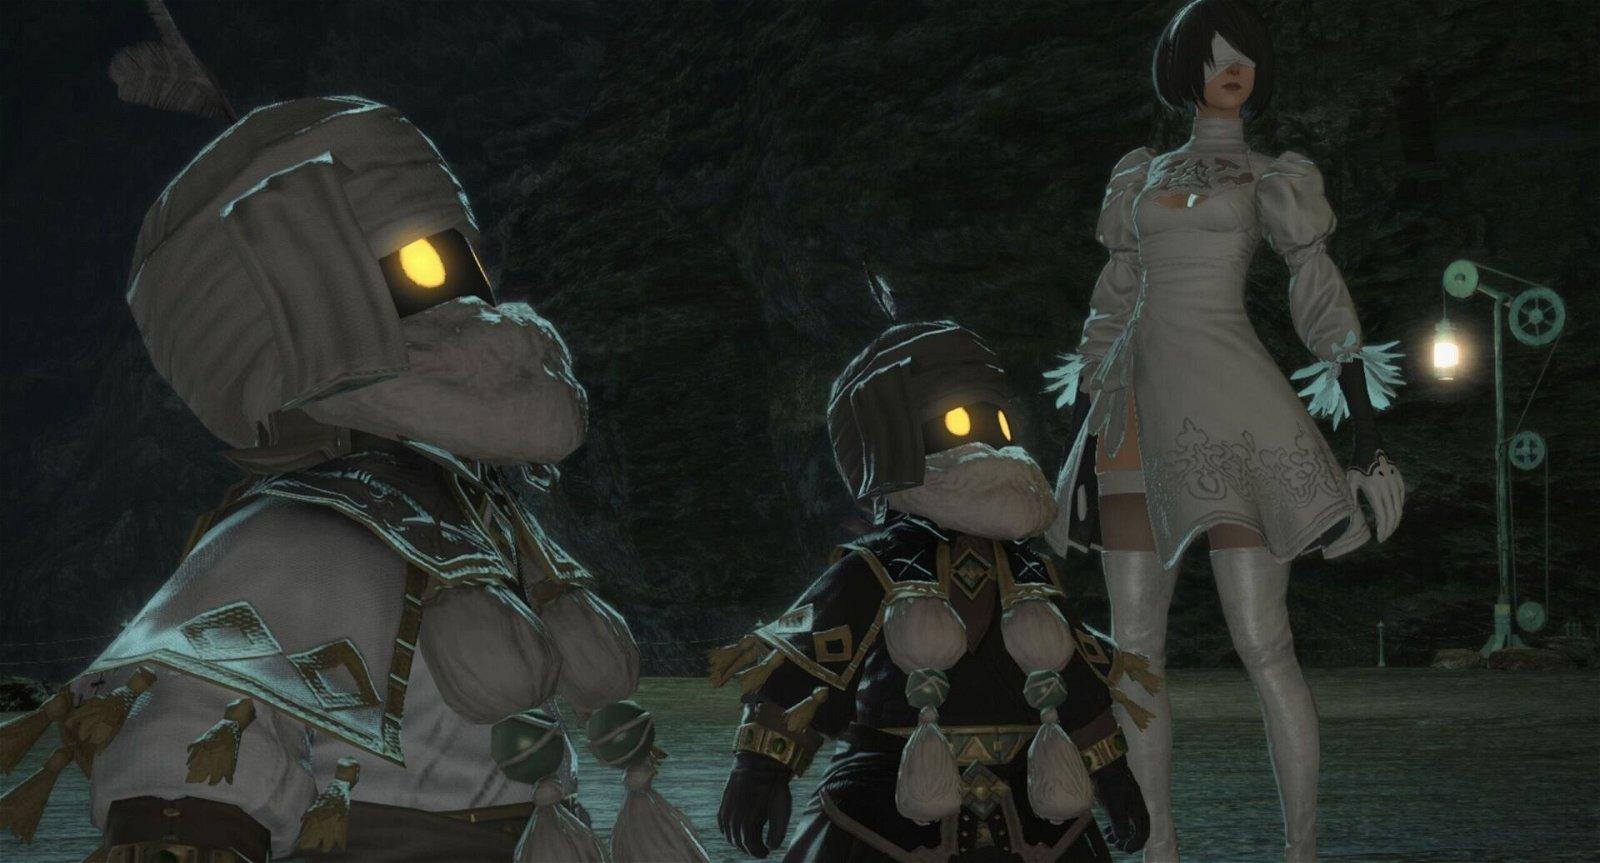 Final Fantasy XIV Unveils the NiER Raid Series in New Trailer